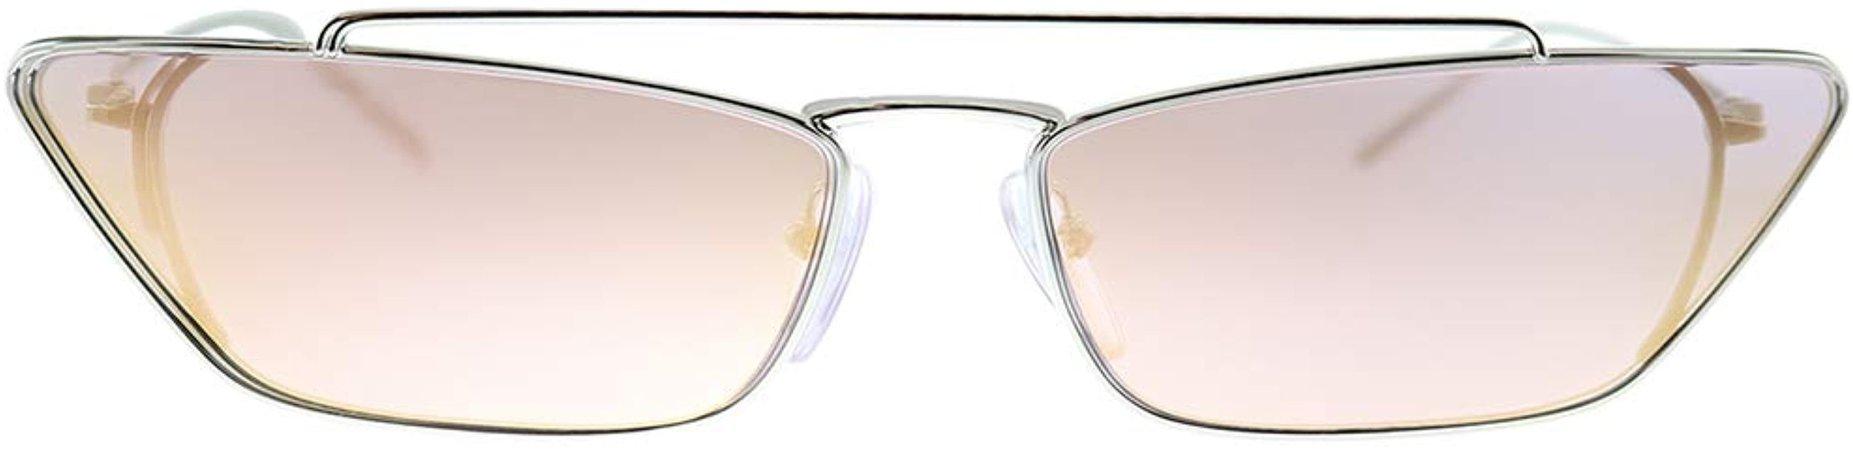 Prada PR 64US 1BC388 Silver Metal Cat-Eye Sunglasses Pink Mirror Lens: Clothing